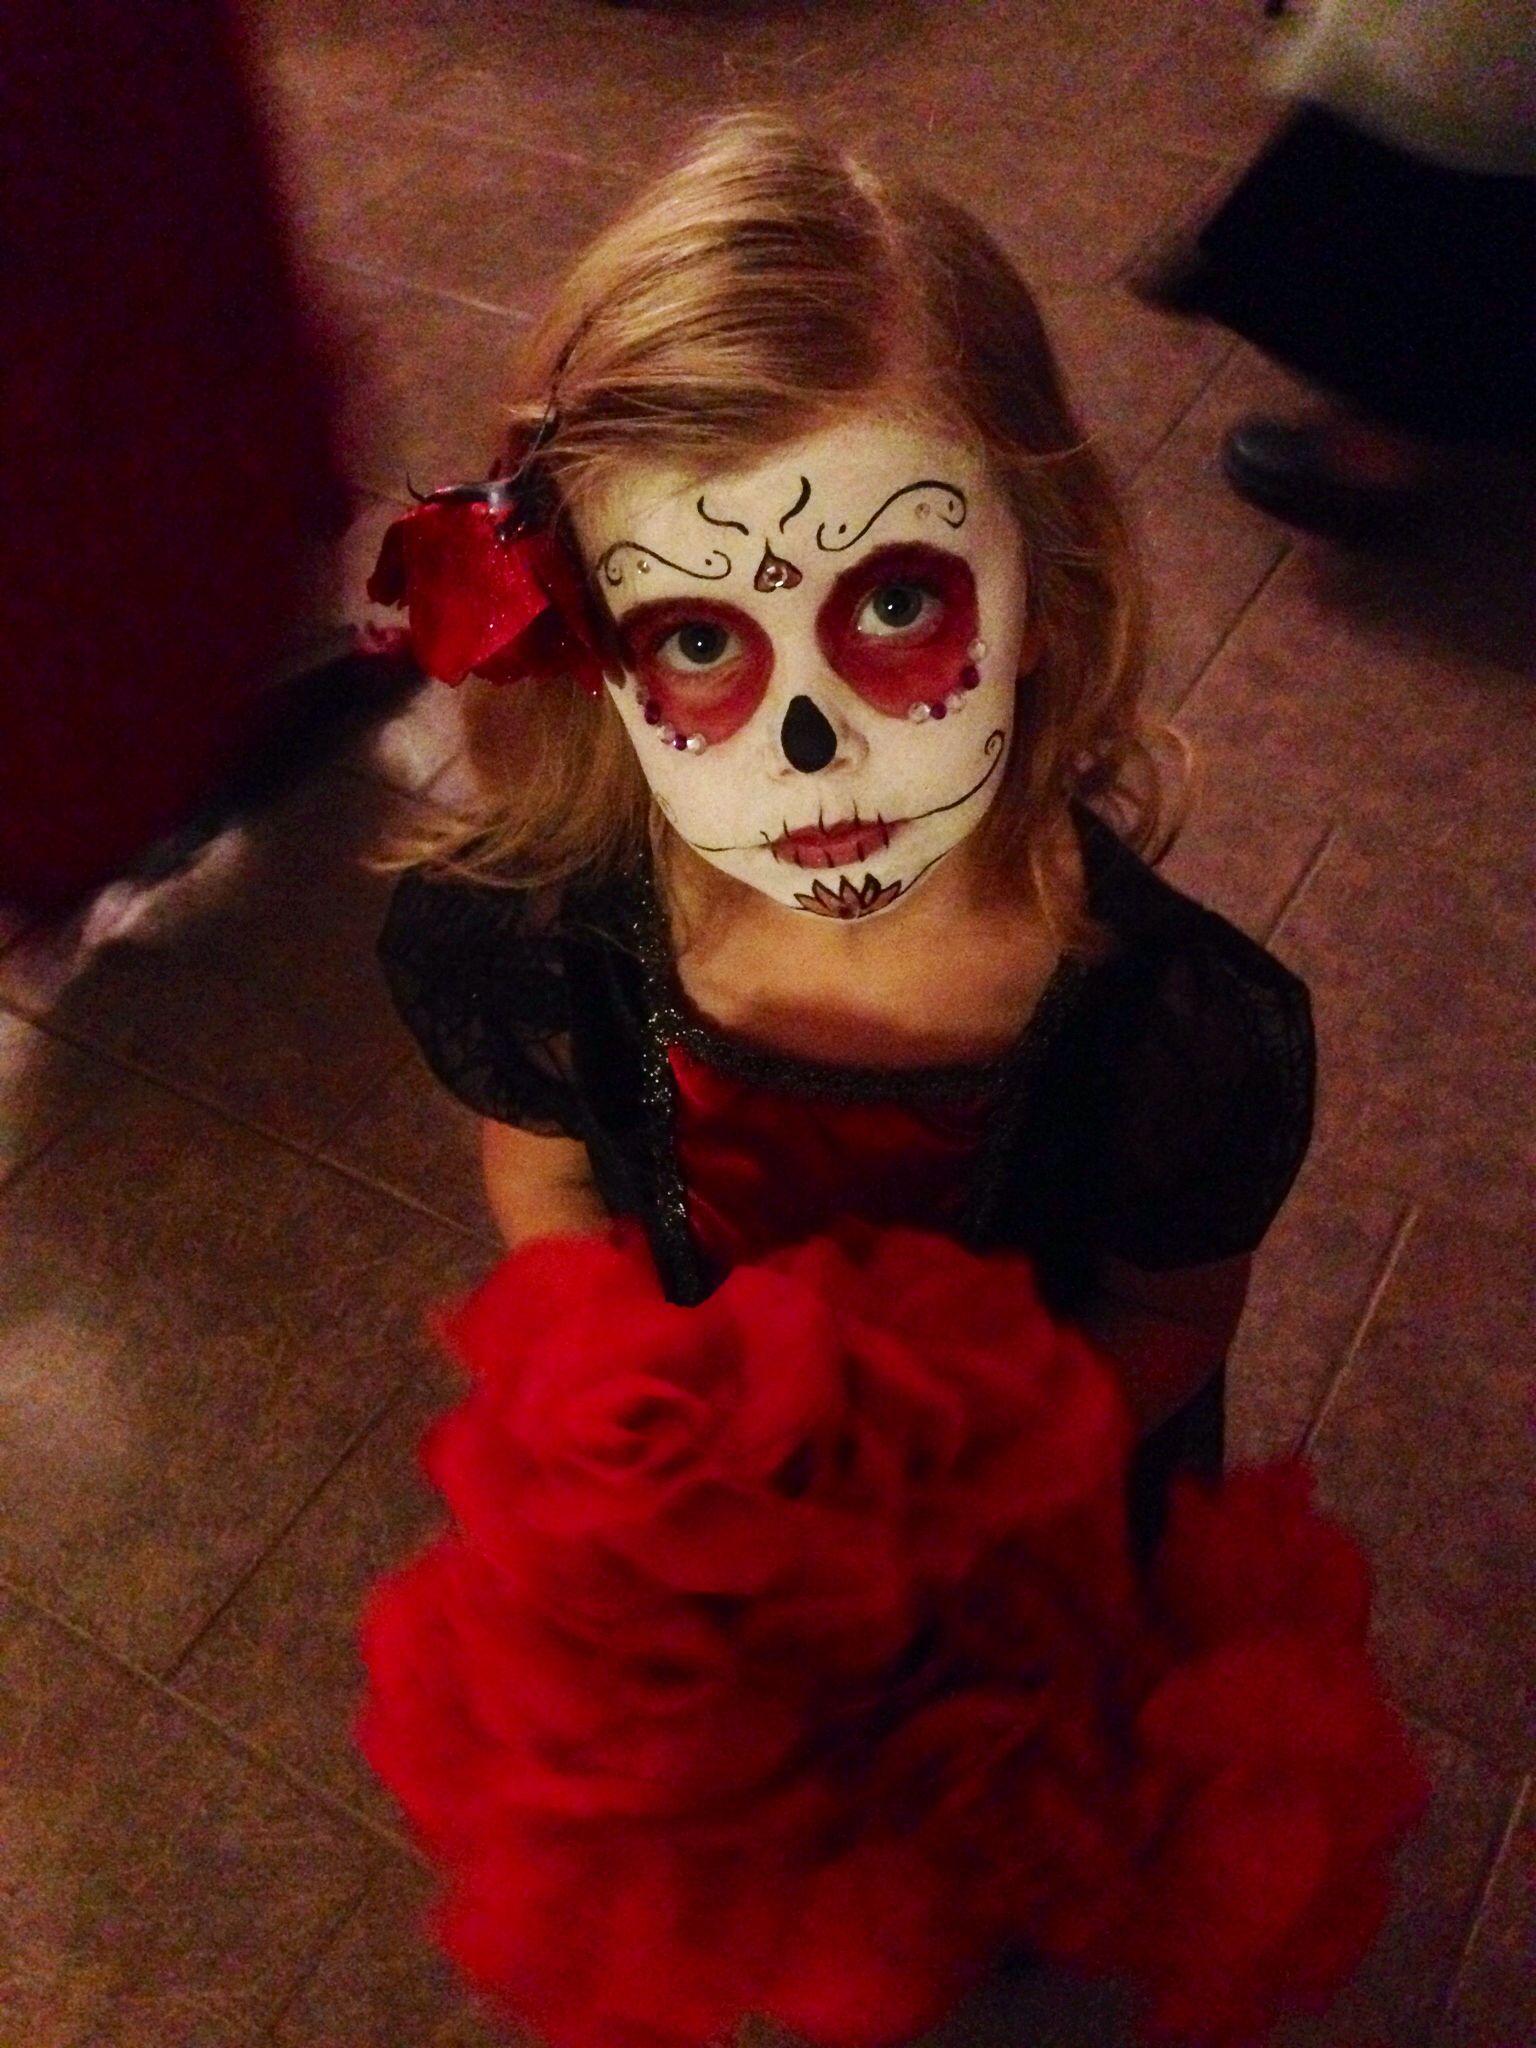 Sugar skull kids makeup   Halloween/Fall   Pinterest   Sugar ...